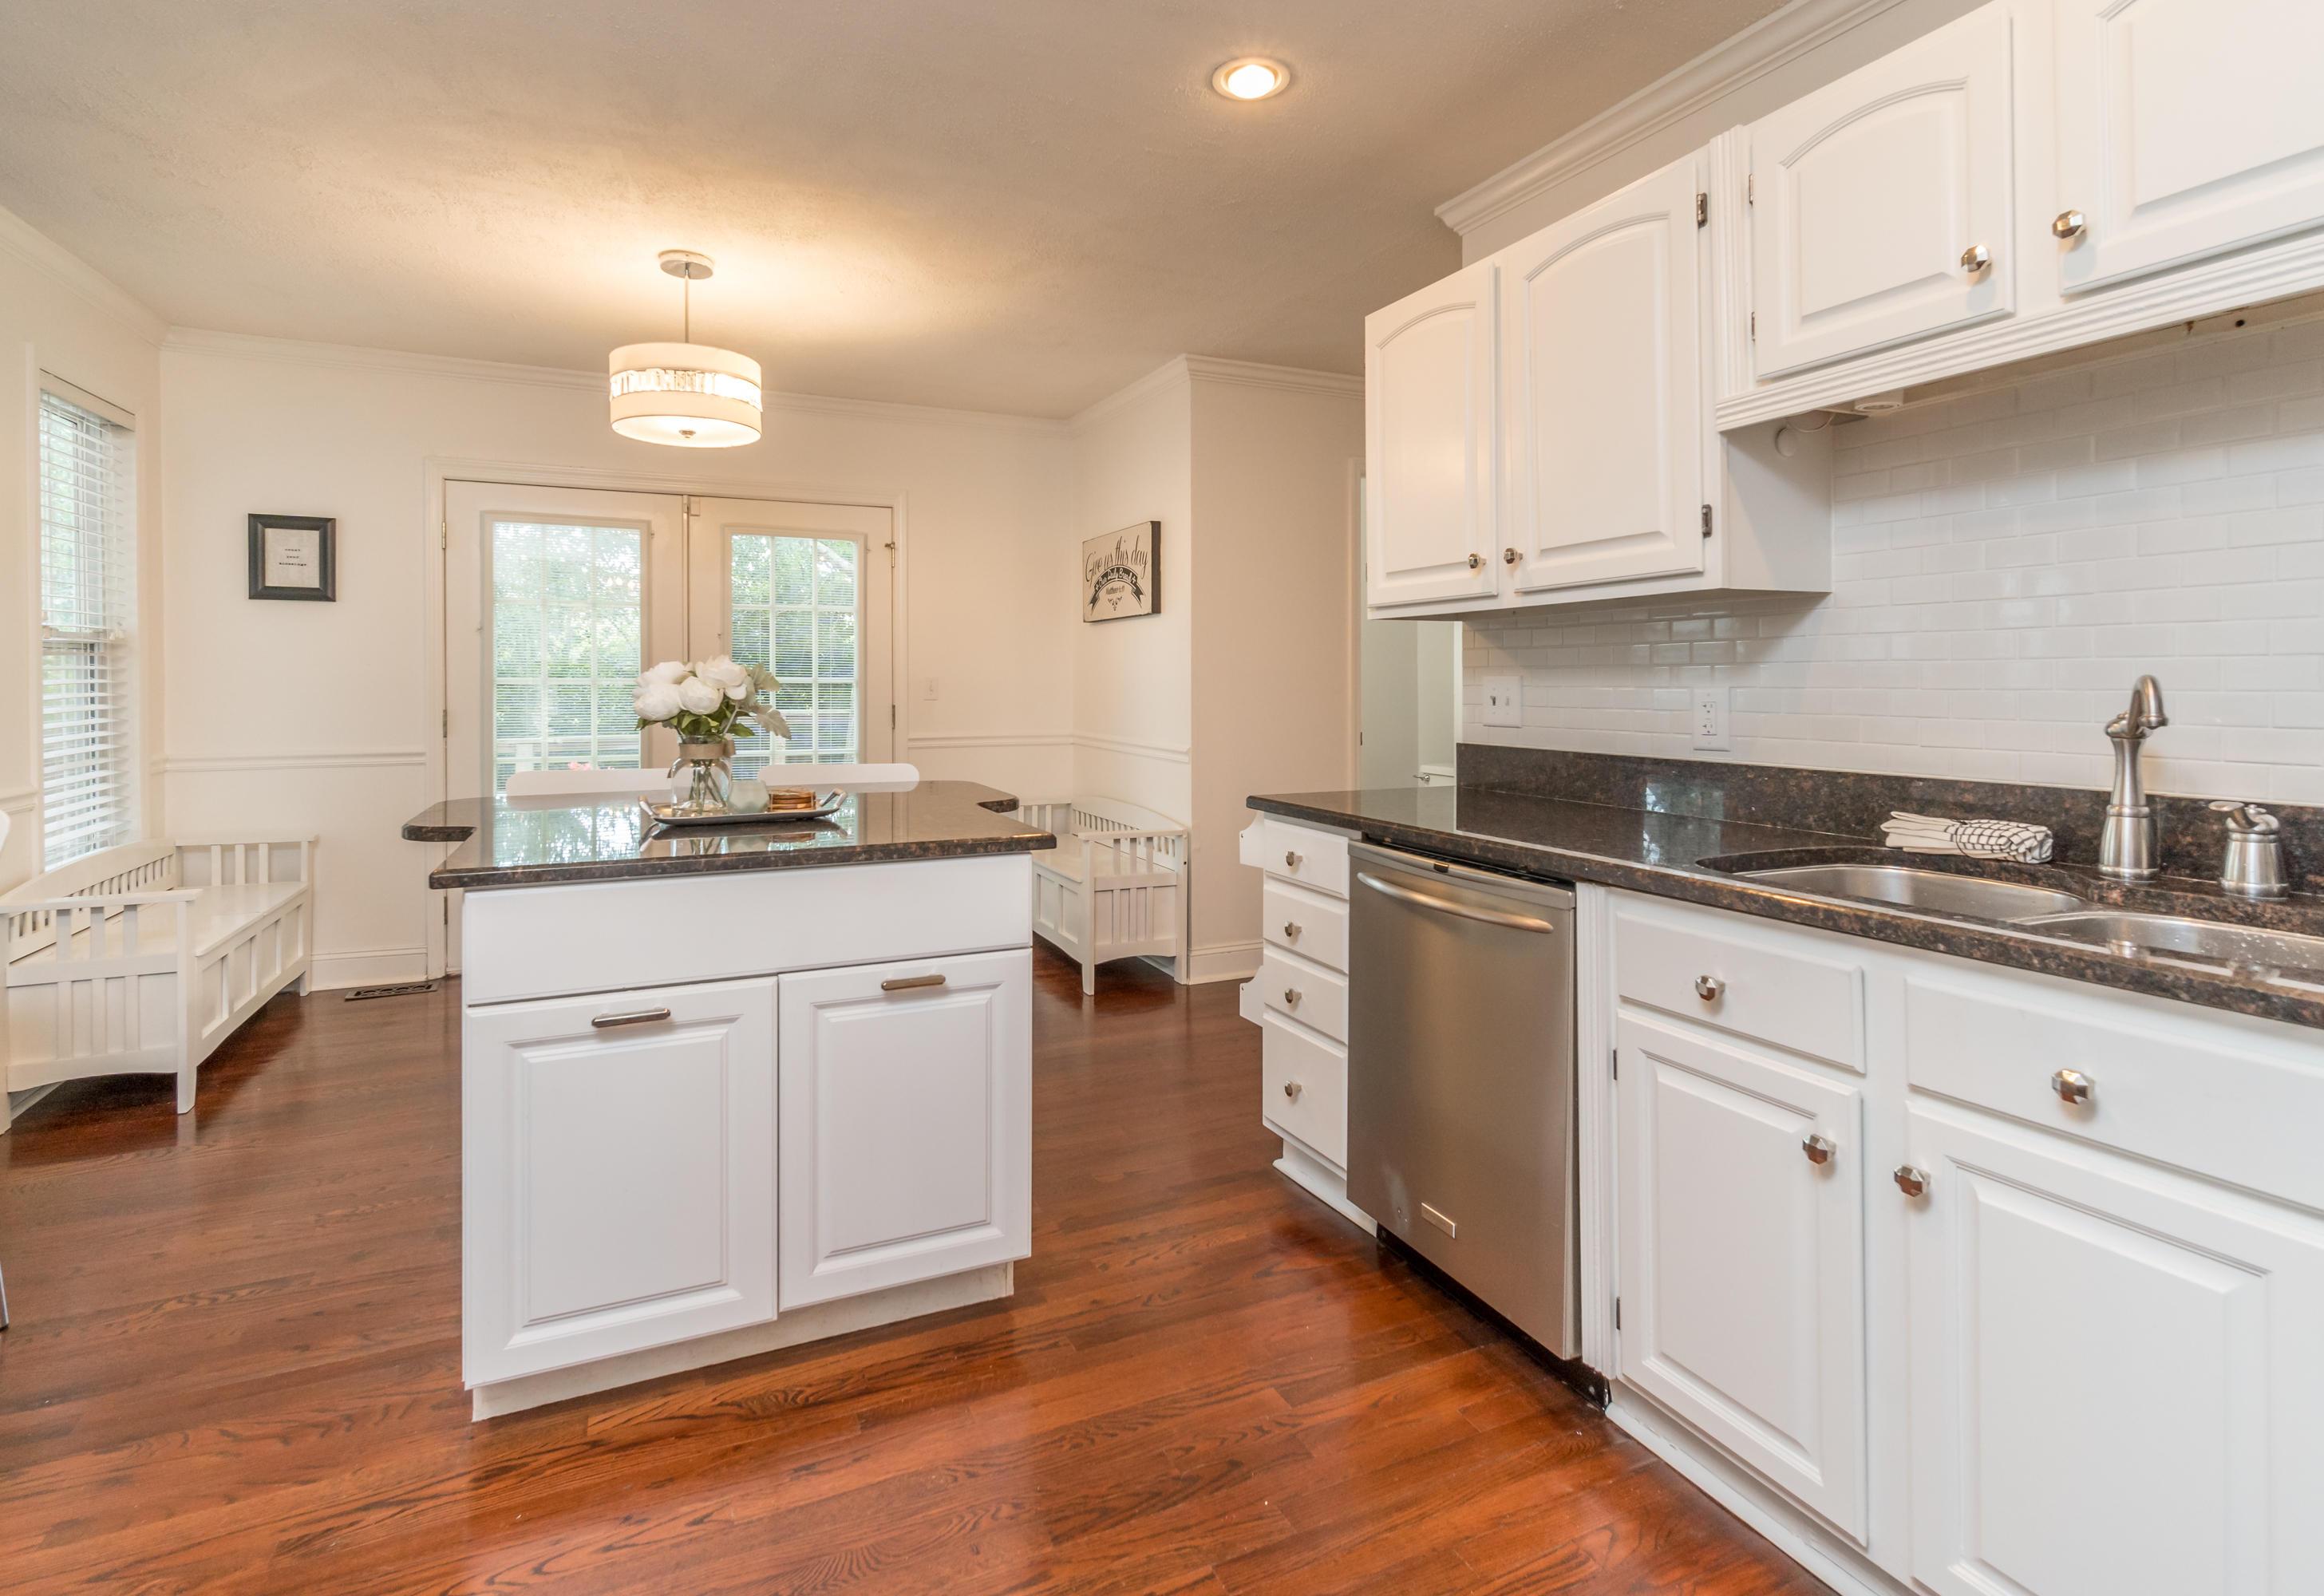 Northwoods Estates Homes For Sale - 8128 Sardis, North Charleston, SC - 32